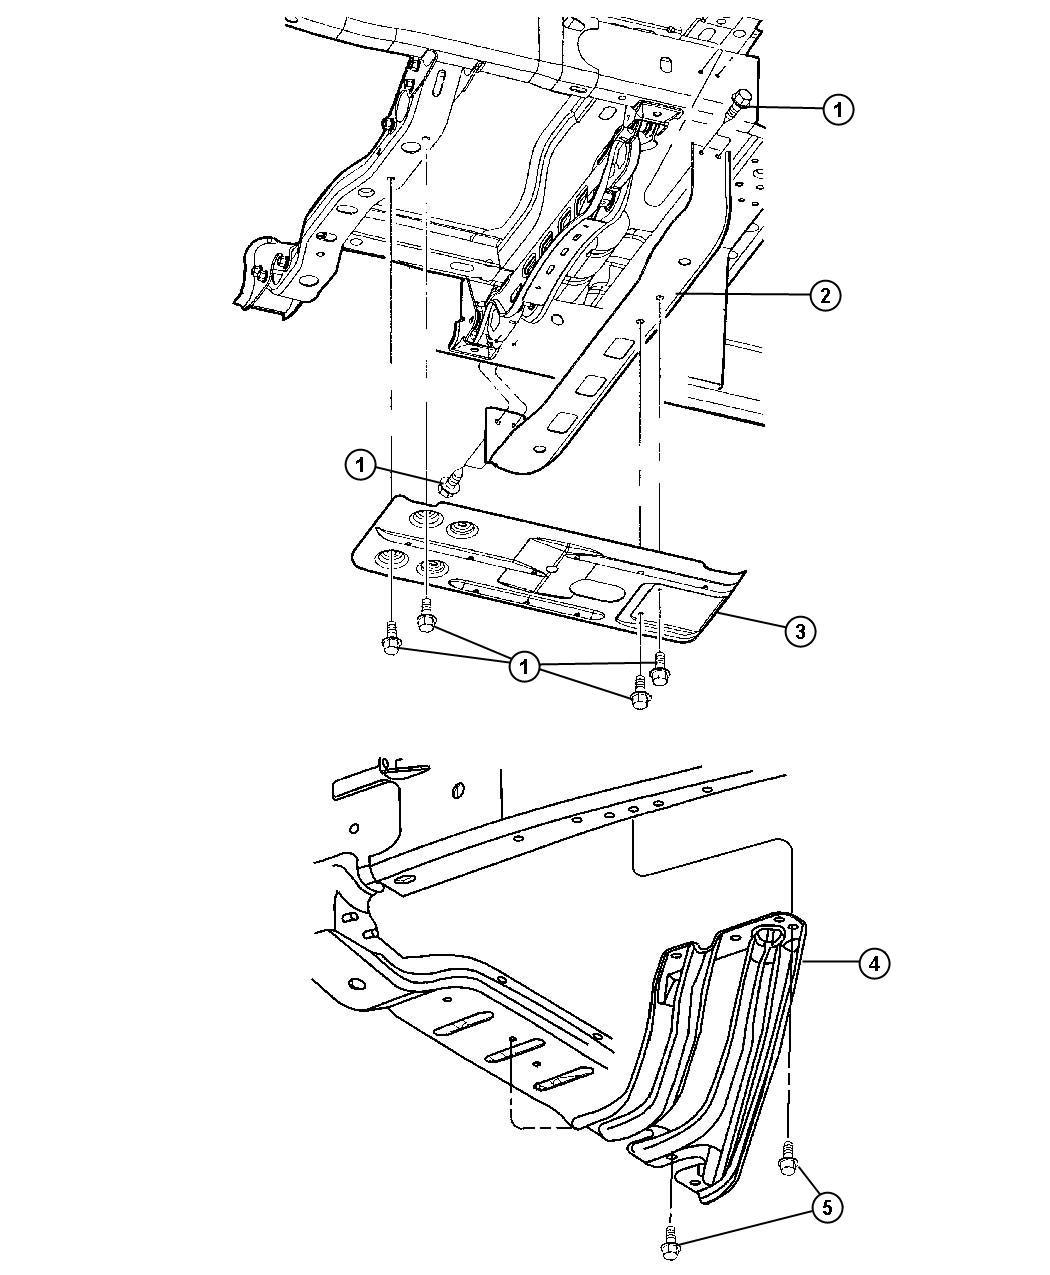 Dodge Ram Crossmember Skid Plate Mounting